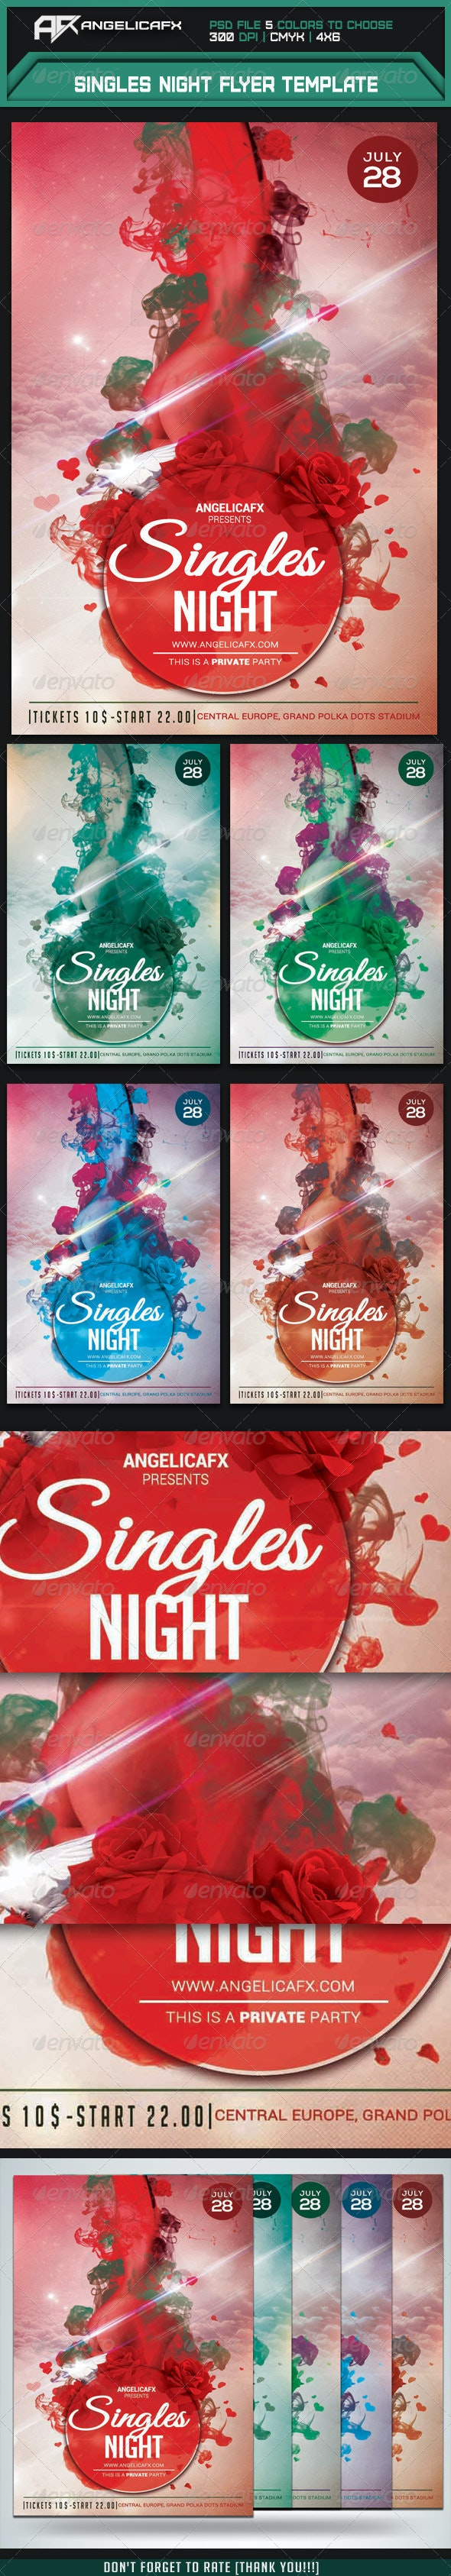 Singles Night Flyer Template - Flyers Print Templates